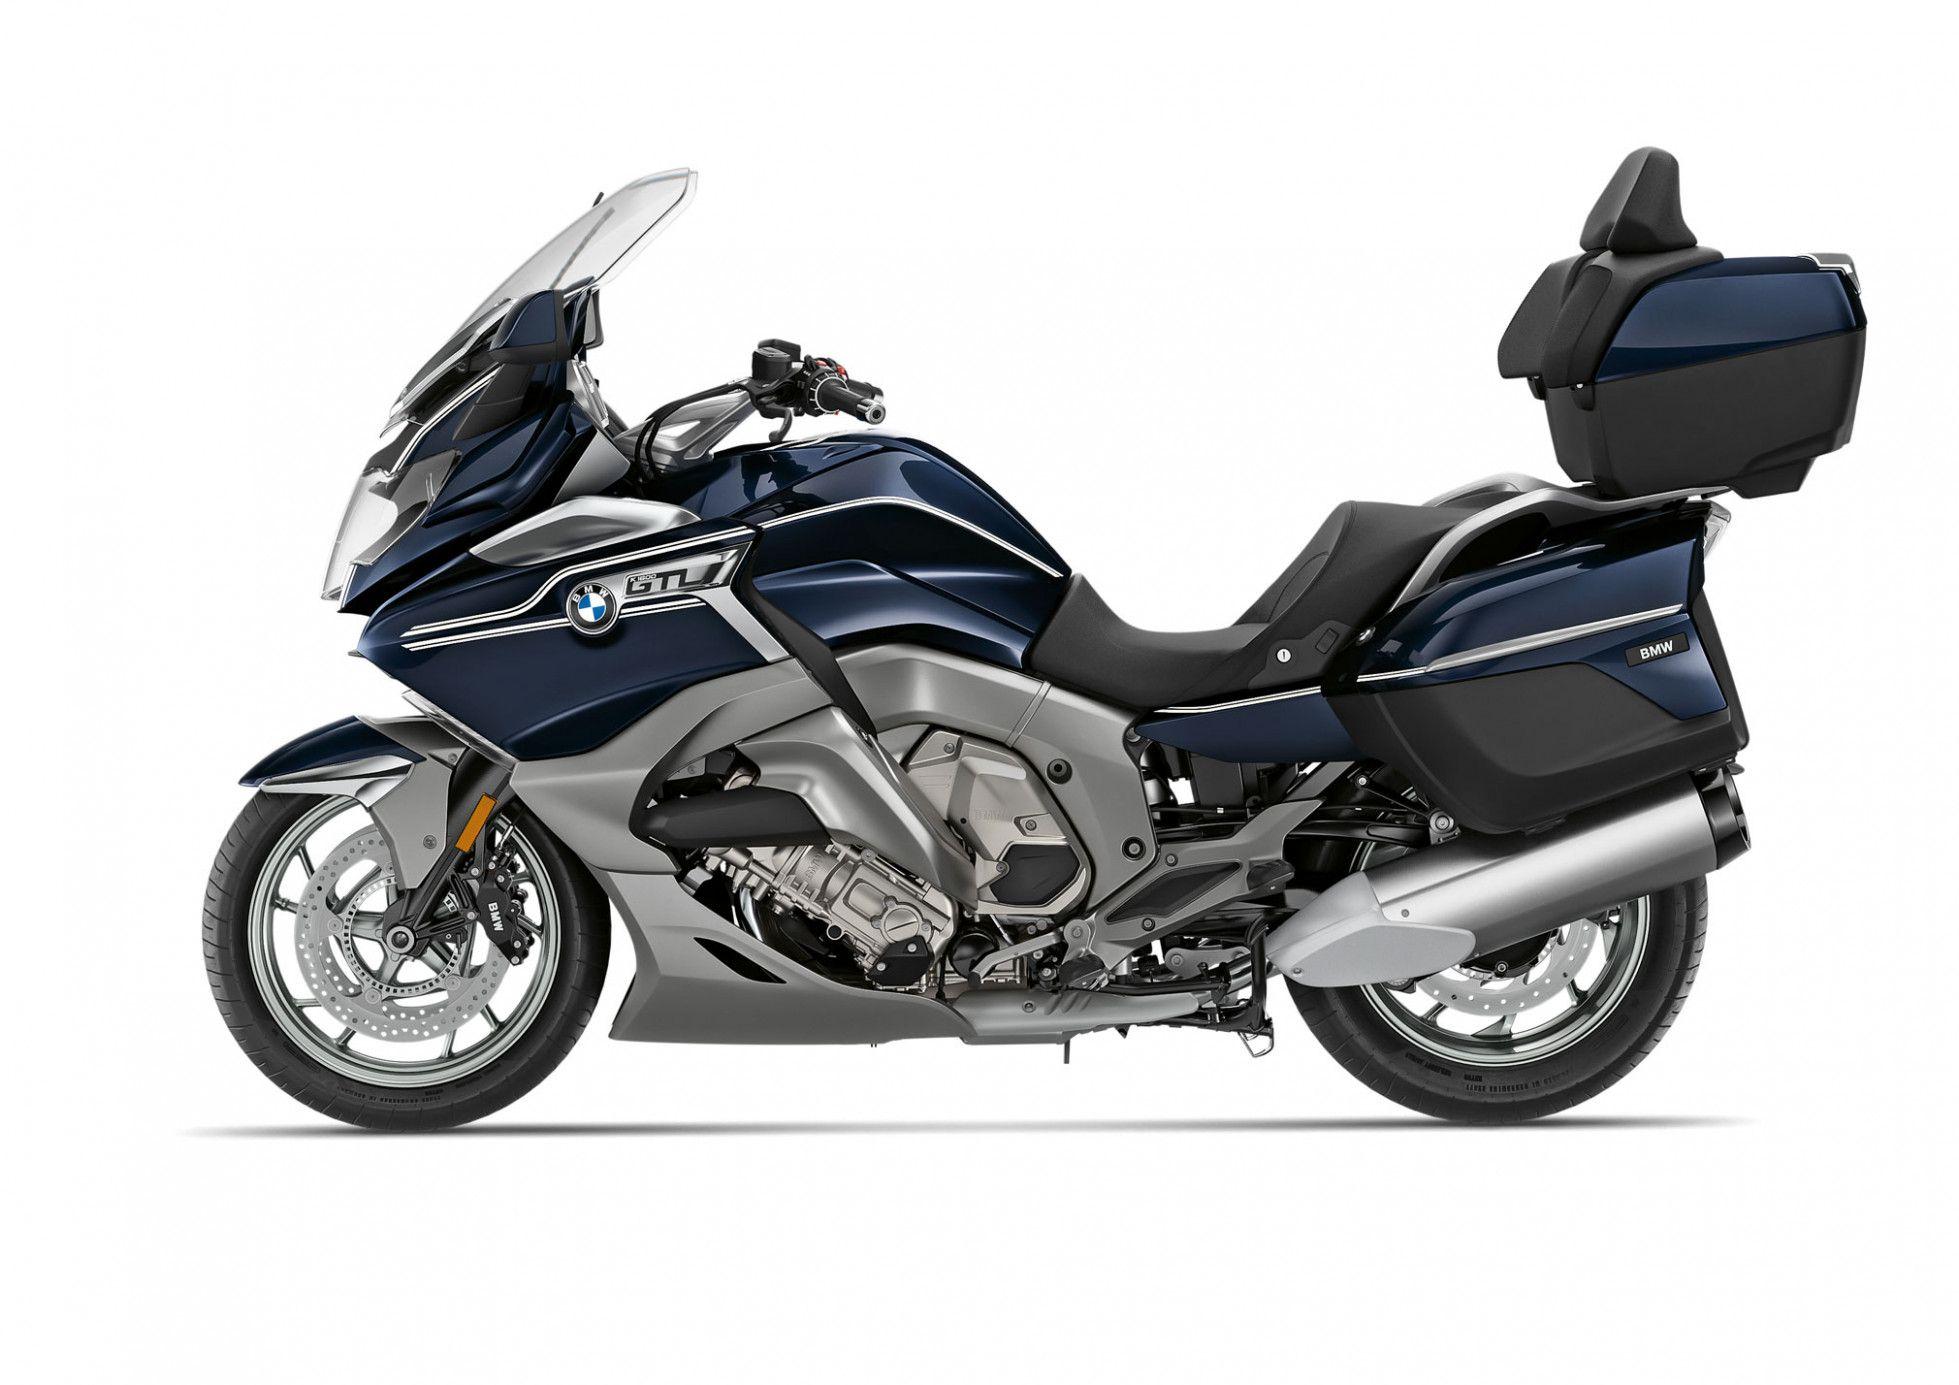 2020 Bmw Gtl 1600 Bmw Motorcycles Bmw Bmw Motorrad